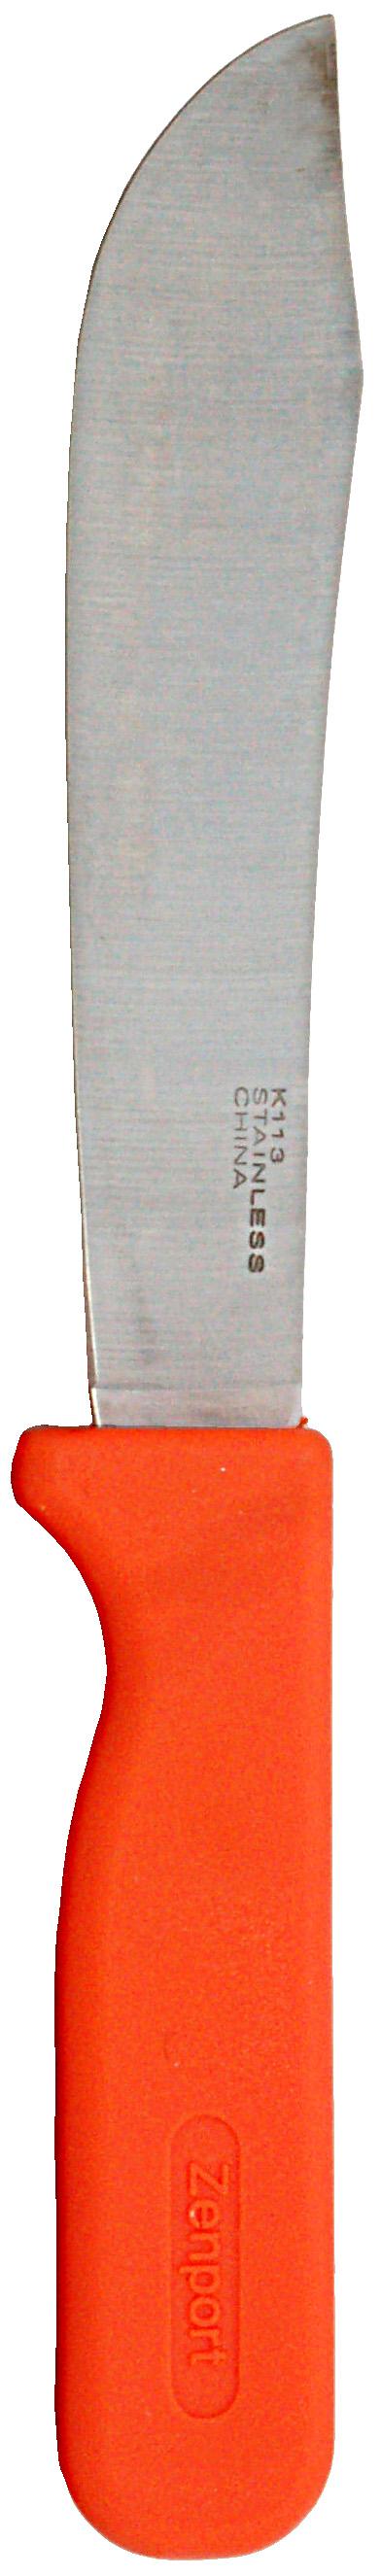 Zenport Industries Zenport K113 Row Crop Harvest Knife, Hops and Cabbage, 6.75-Inch Stainless Steel Blade at Sears.com